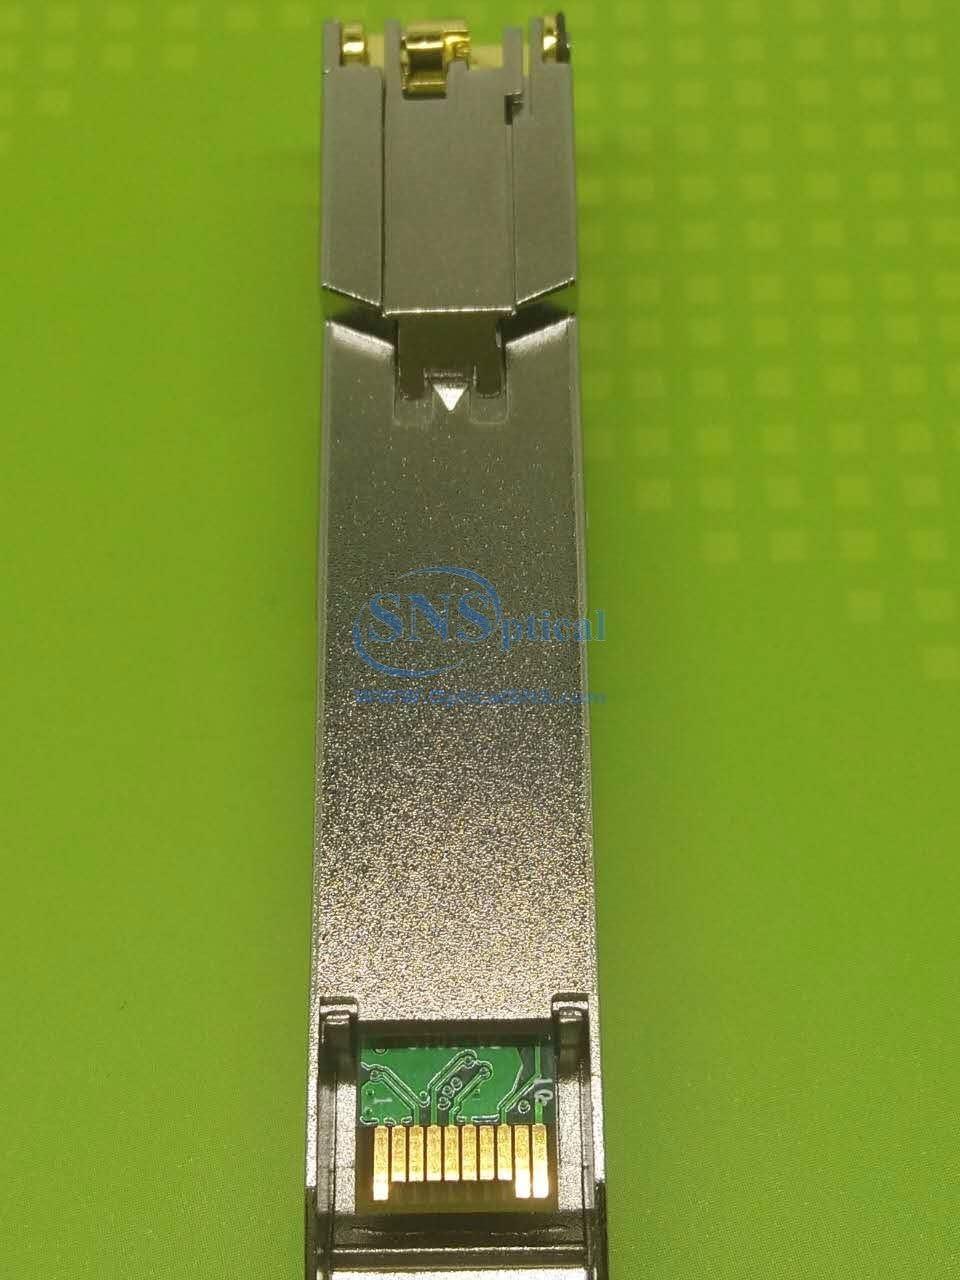 SnS ONS-SE-ZE-EL Compatible with ONS-SE-ZE-EL 10//100 SFP 100M SMF Transceiver Module